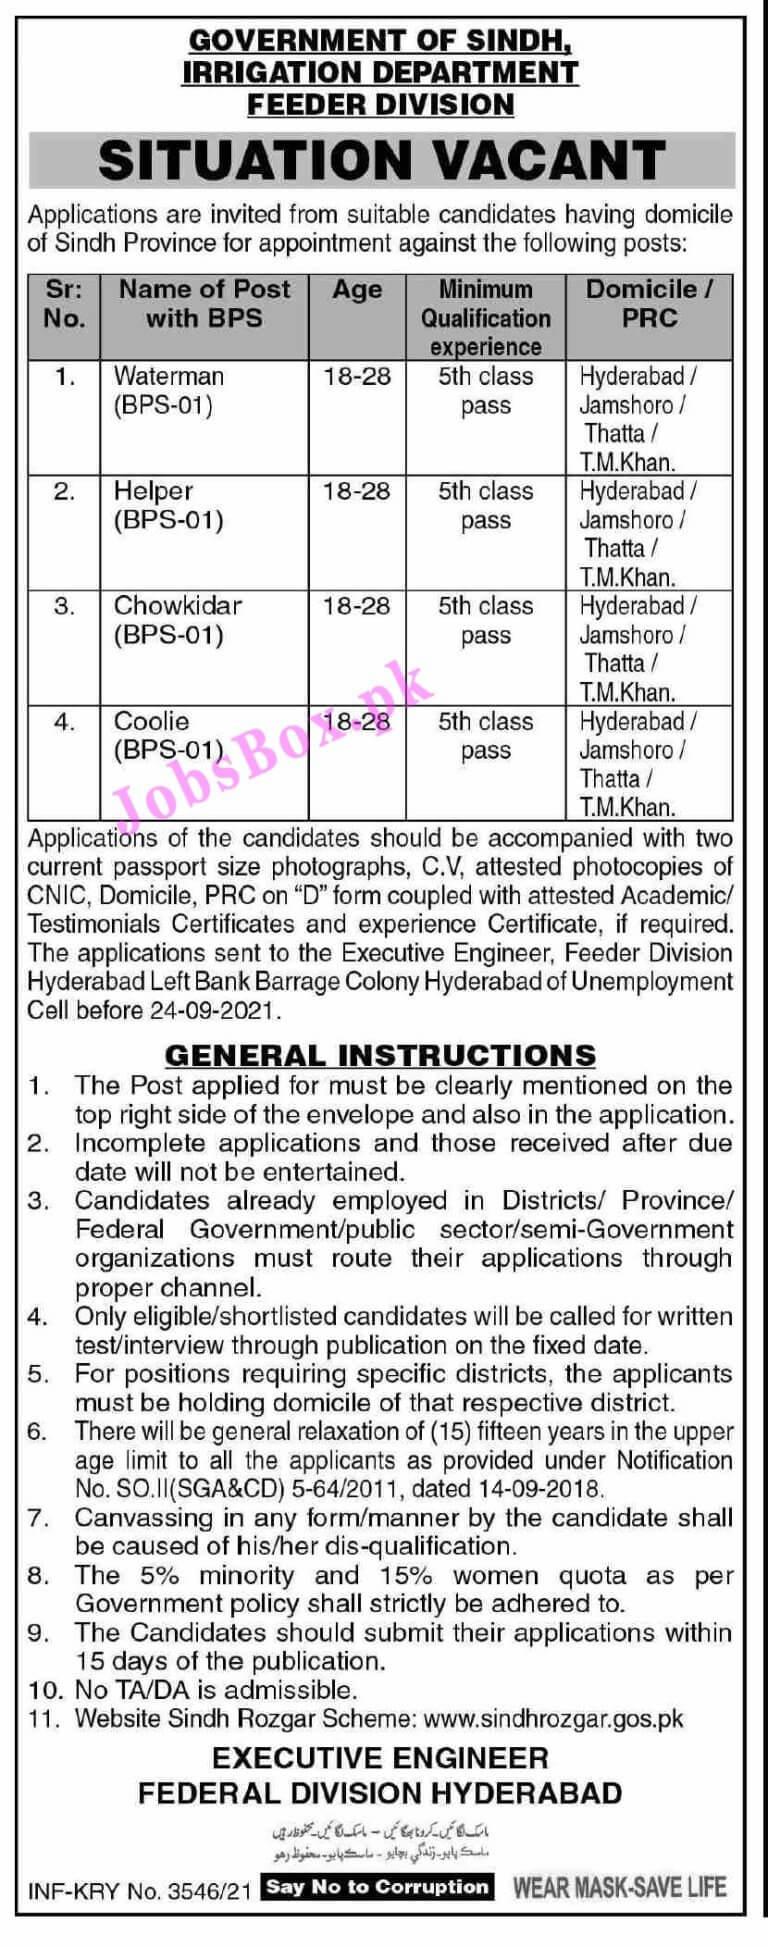 Irrigation Department Sindh Jobs 2021 in Pakistan - Sindh Govt Jobs 2021